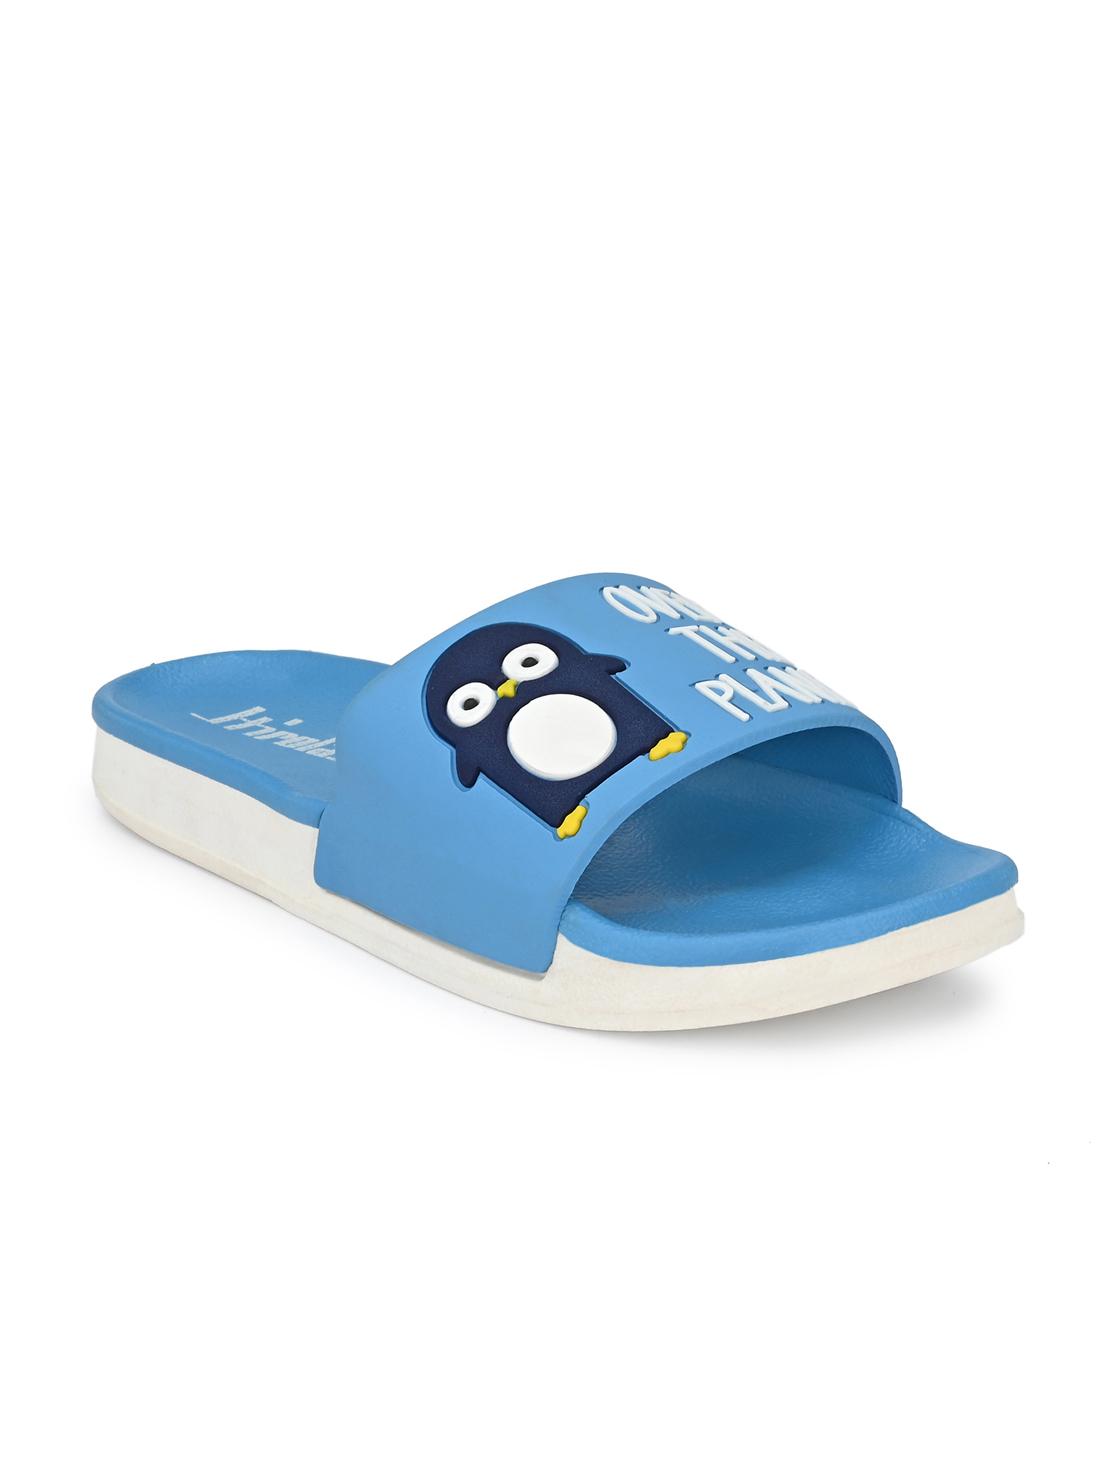 Hirolas | Hirolas® Women designed Slipper Sliders - Blue